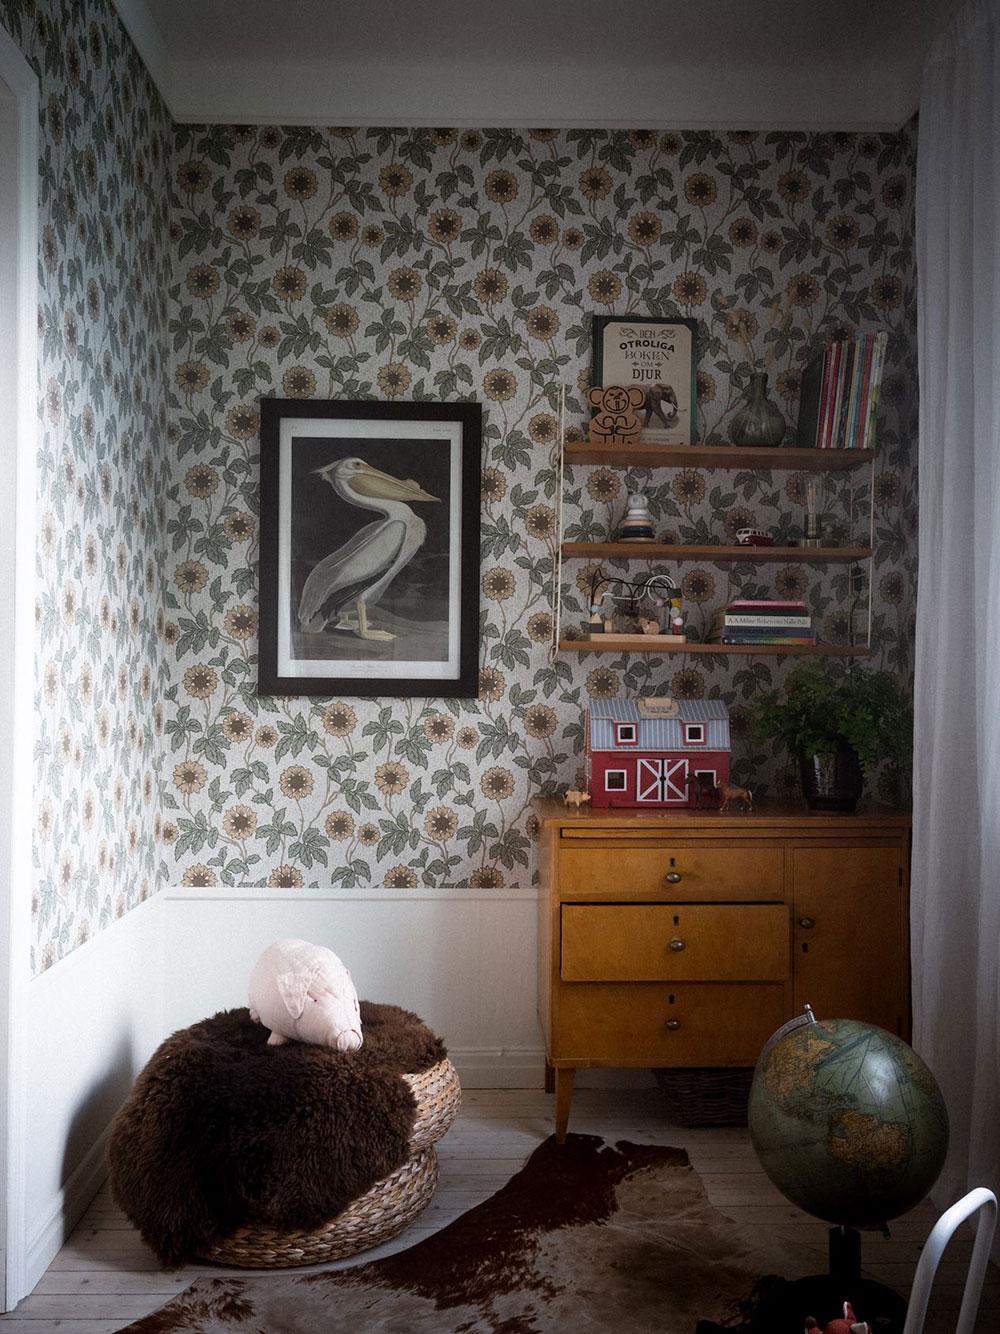 childrens-room-wallpaper-vintage-decor-scandinavian-apartment-nordroom